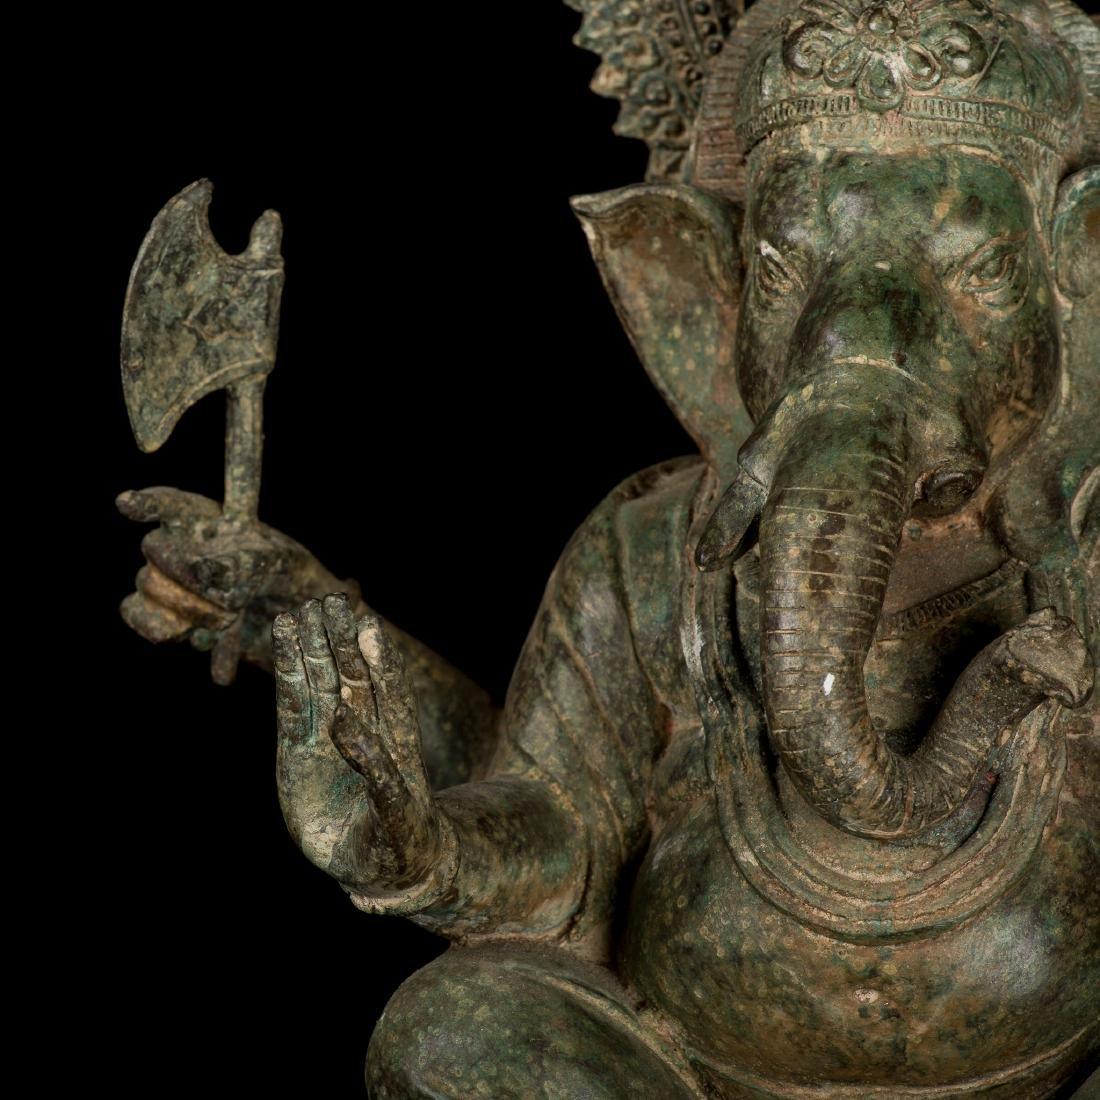 19th Century Antique Seated Bronze Ganesha Statue - 6